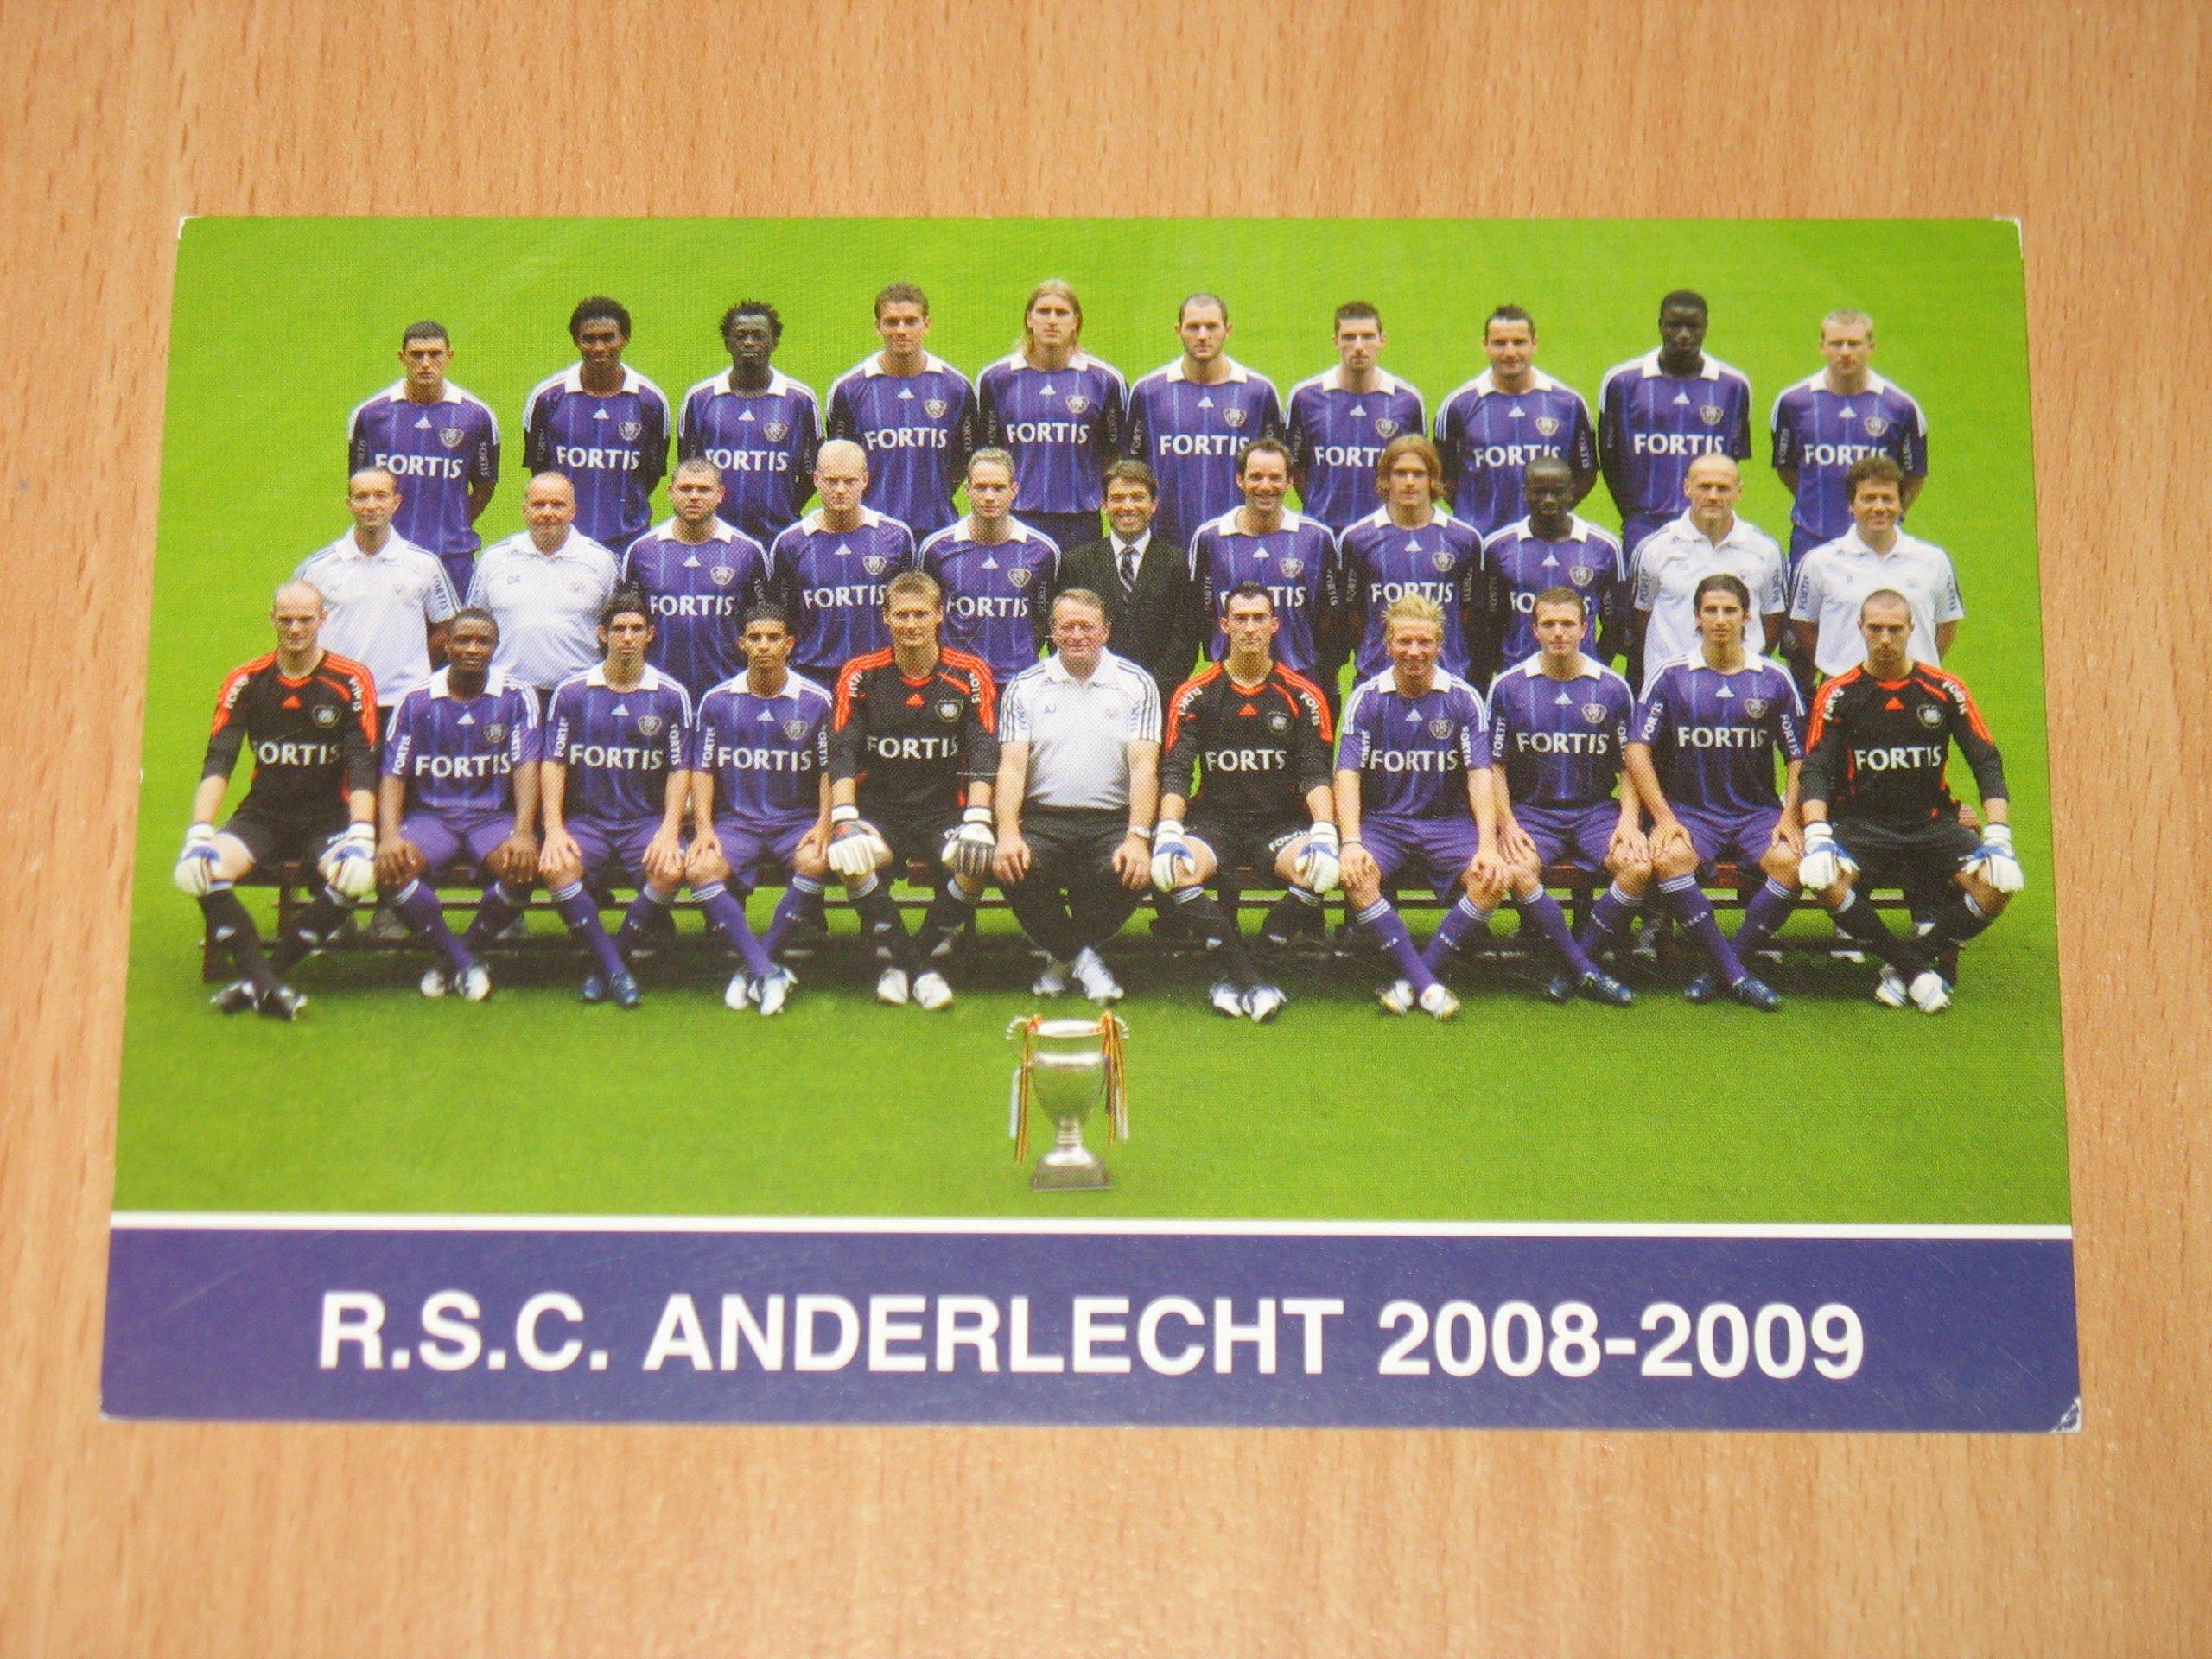 Piłka nożna - fotos zespołu Anderlecht Bruksela